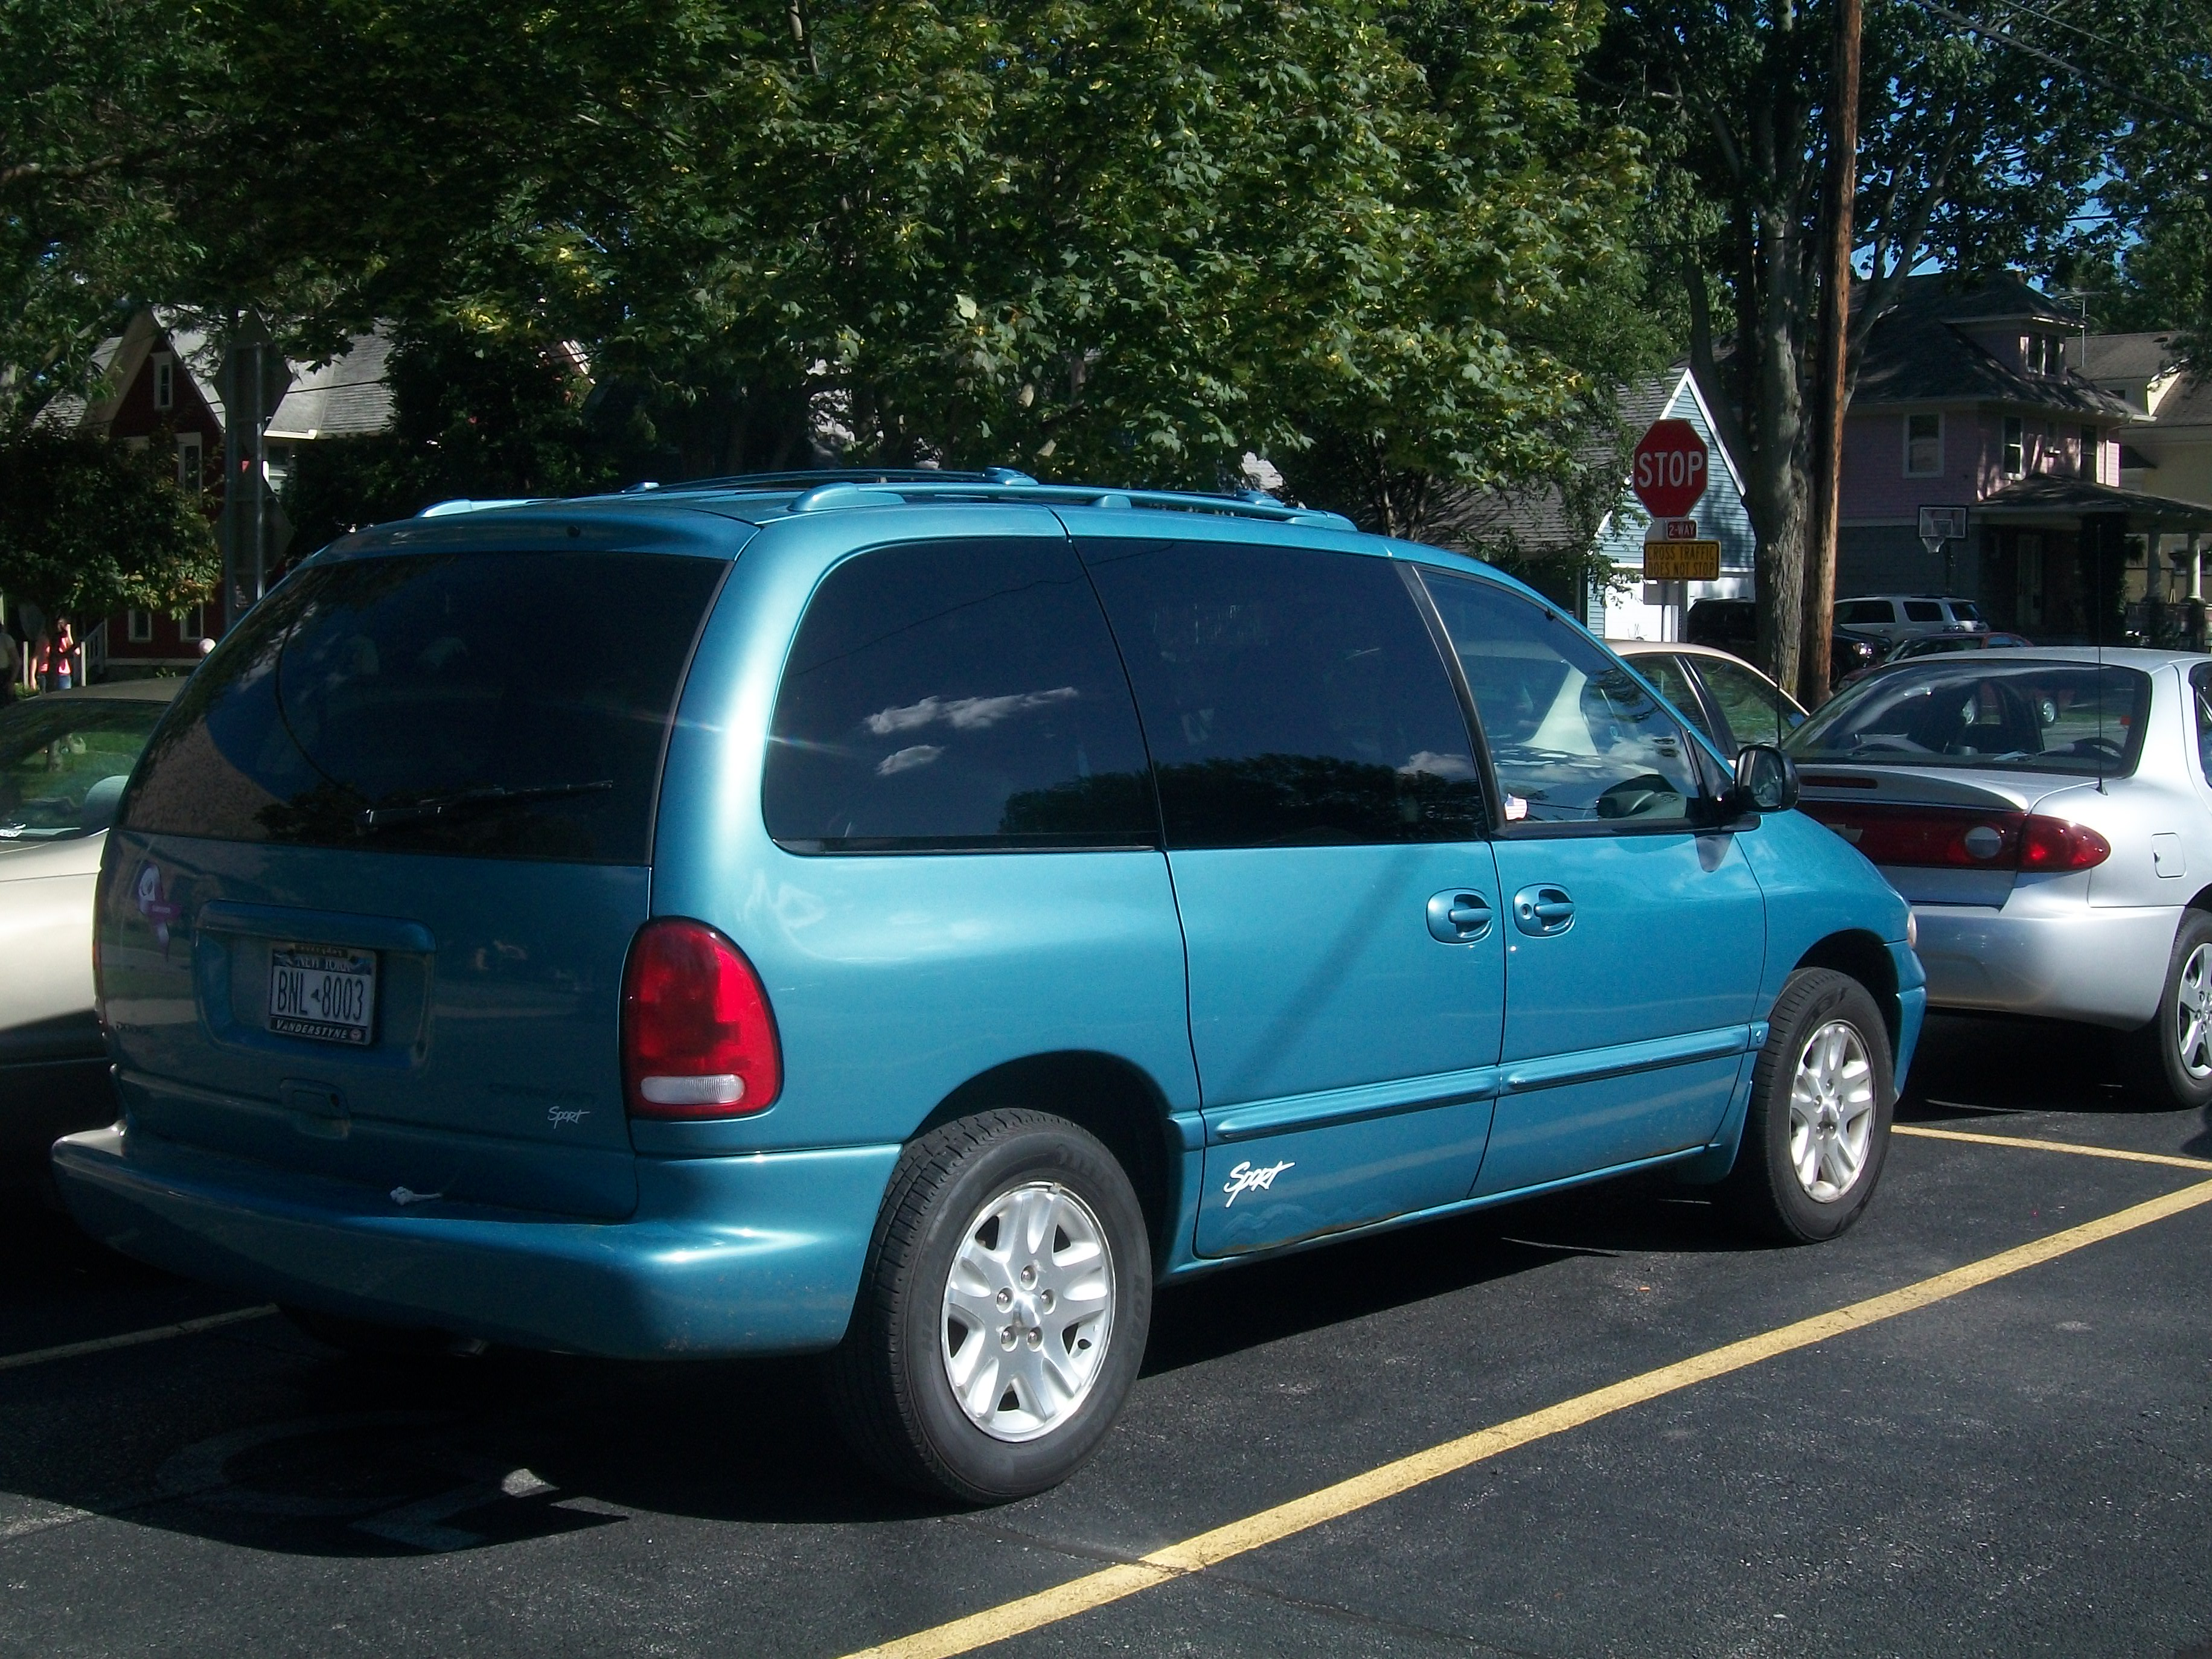 Build A Dodge >> File:1999 Dodge Grand Caravan Sport.JPG - Wikimedia Commons